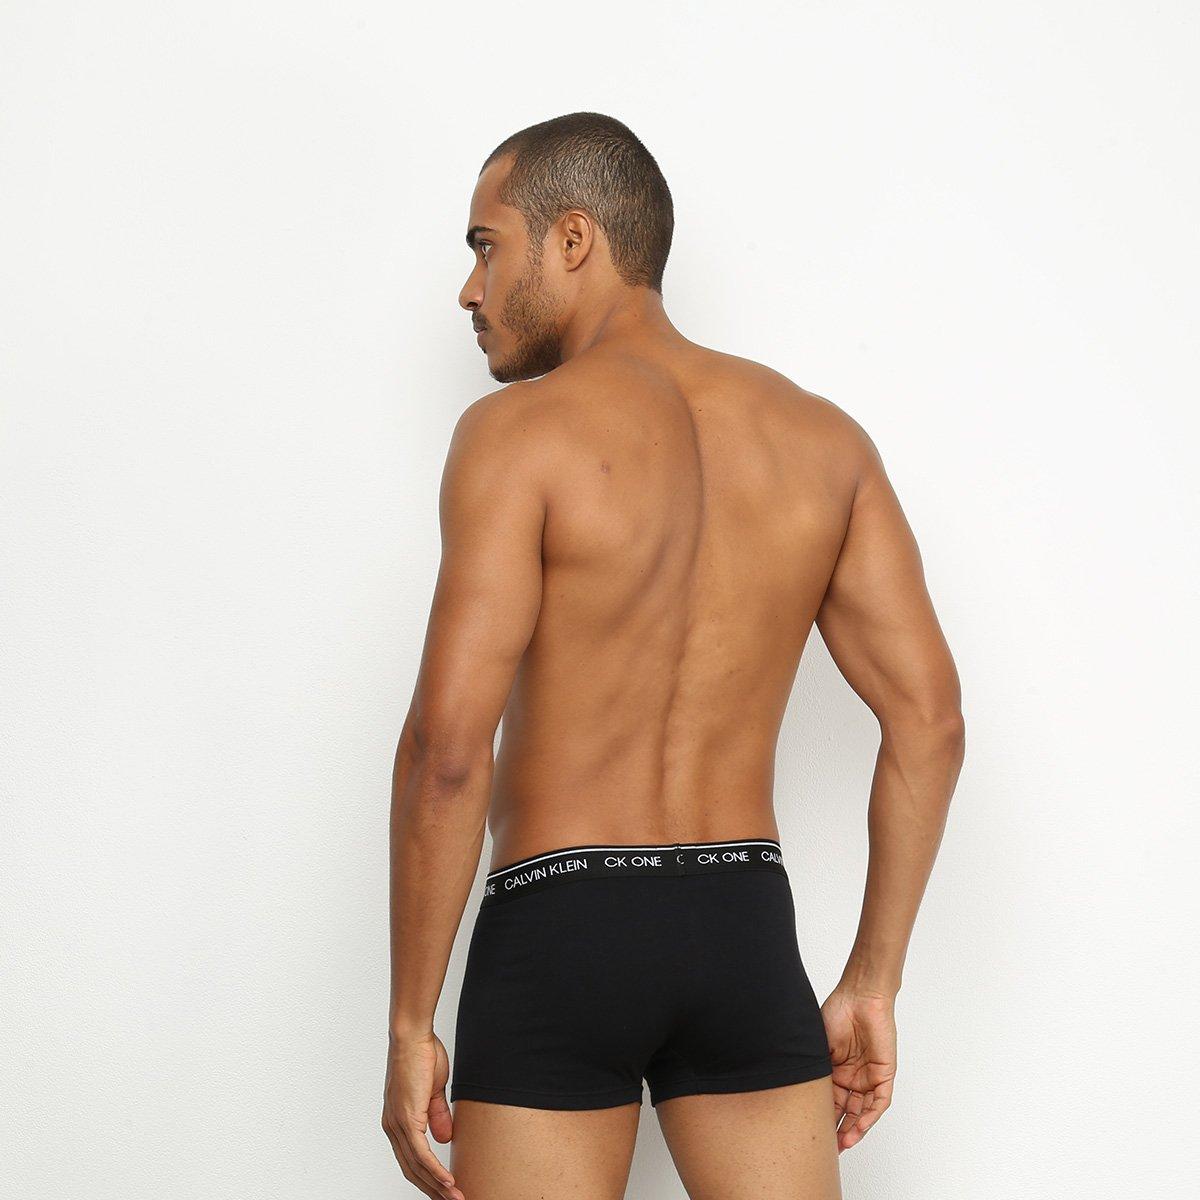 Cueca Boxer Calvin Klein Low Rise Trunk CK One Basic